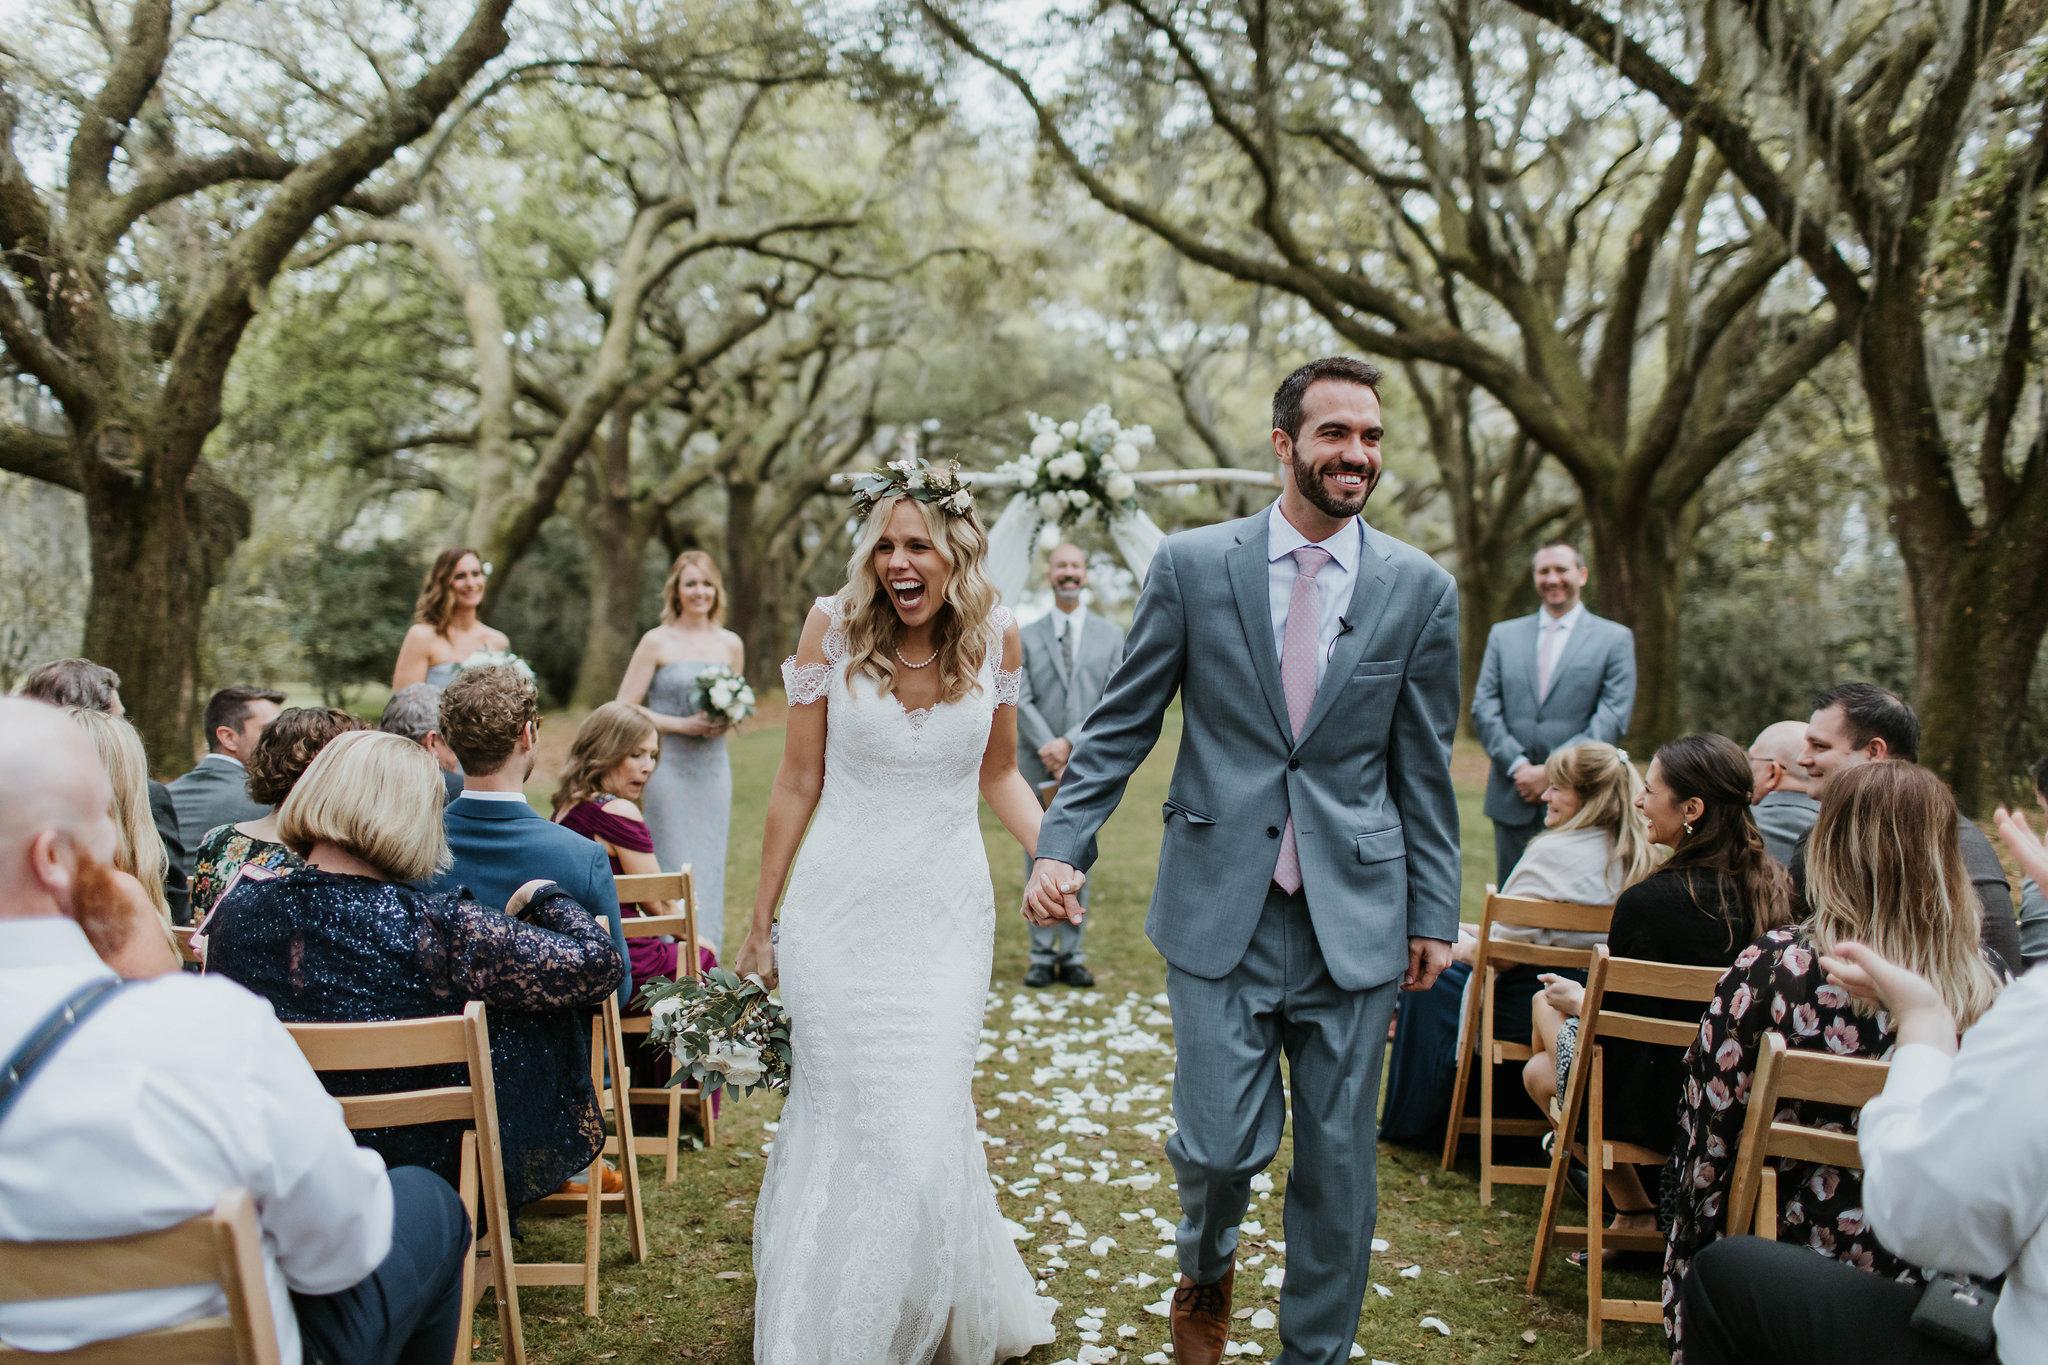 Legare-Waring-House-Charleston-SC-wedding-portrait-photography-178.jpg